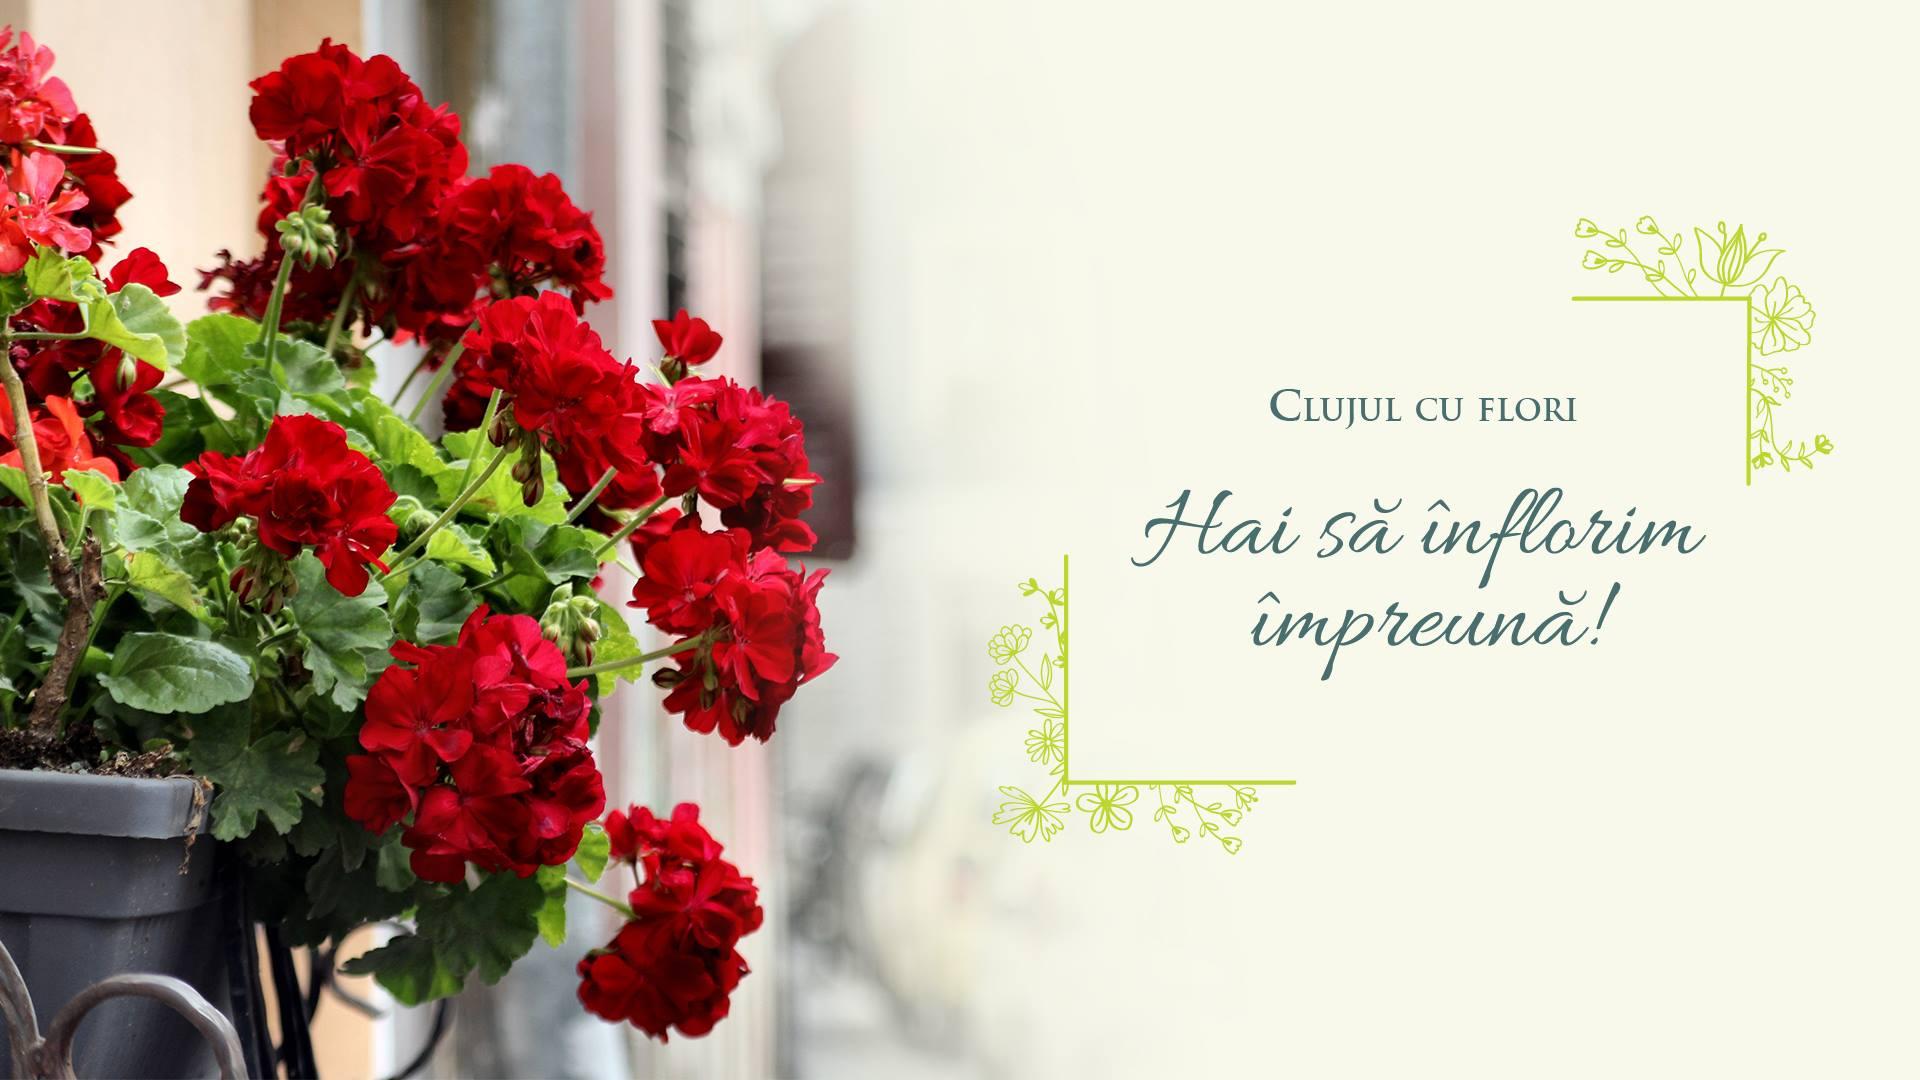 Clujul cu flori 2019